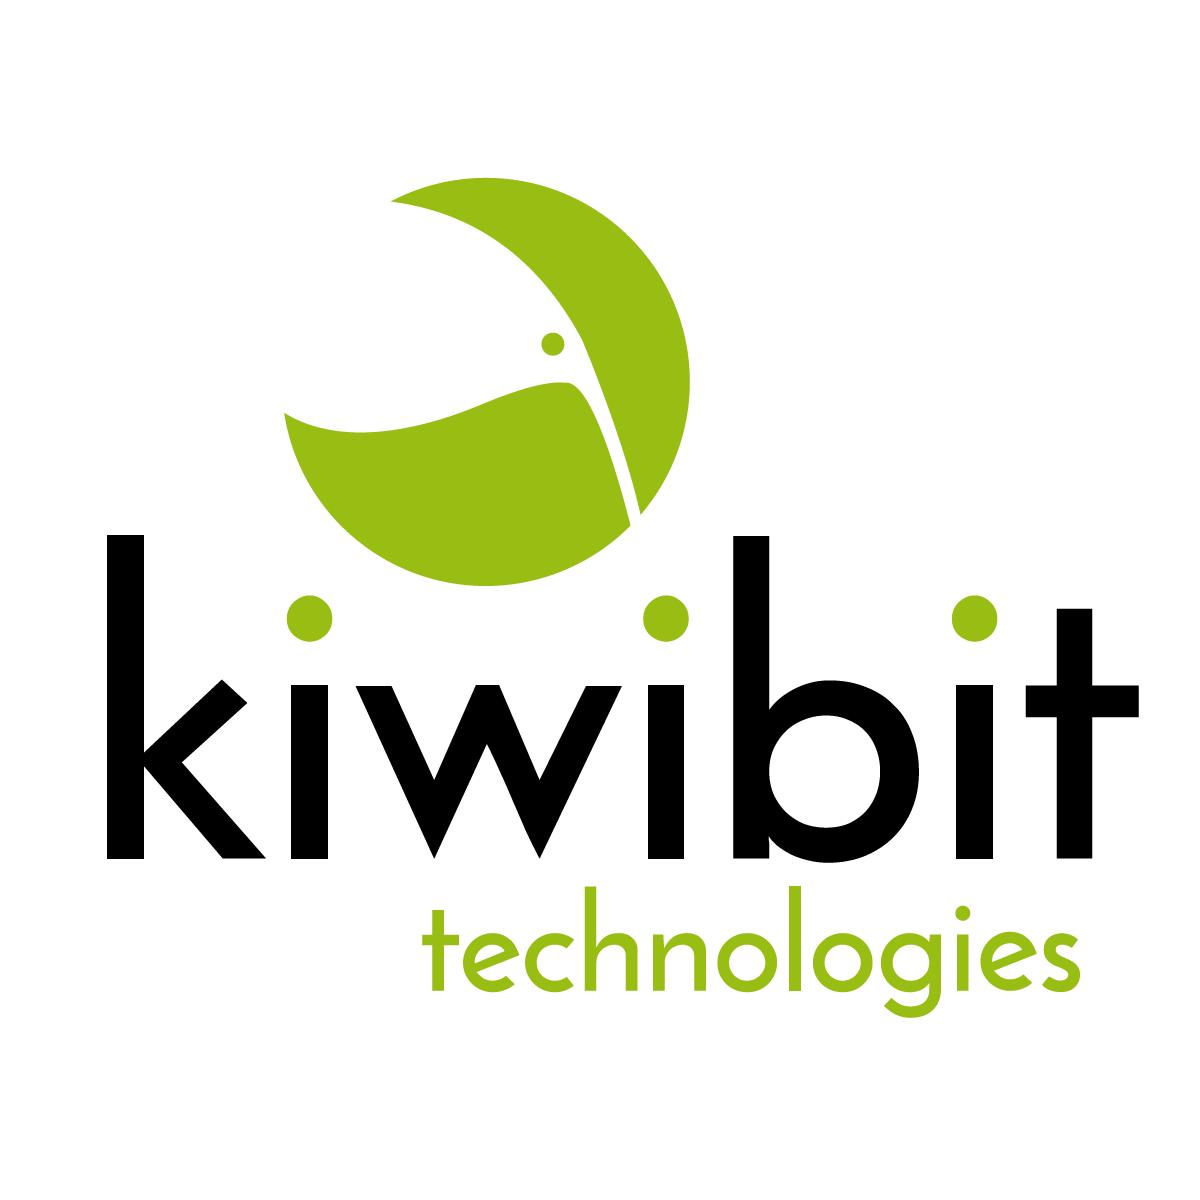 Kiwibit